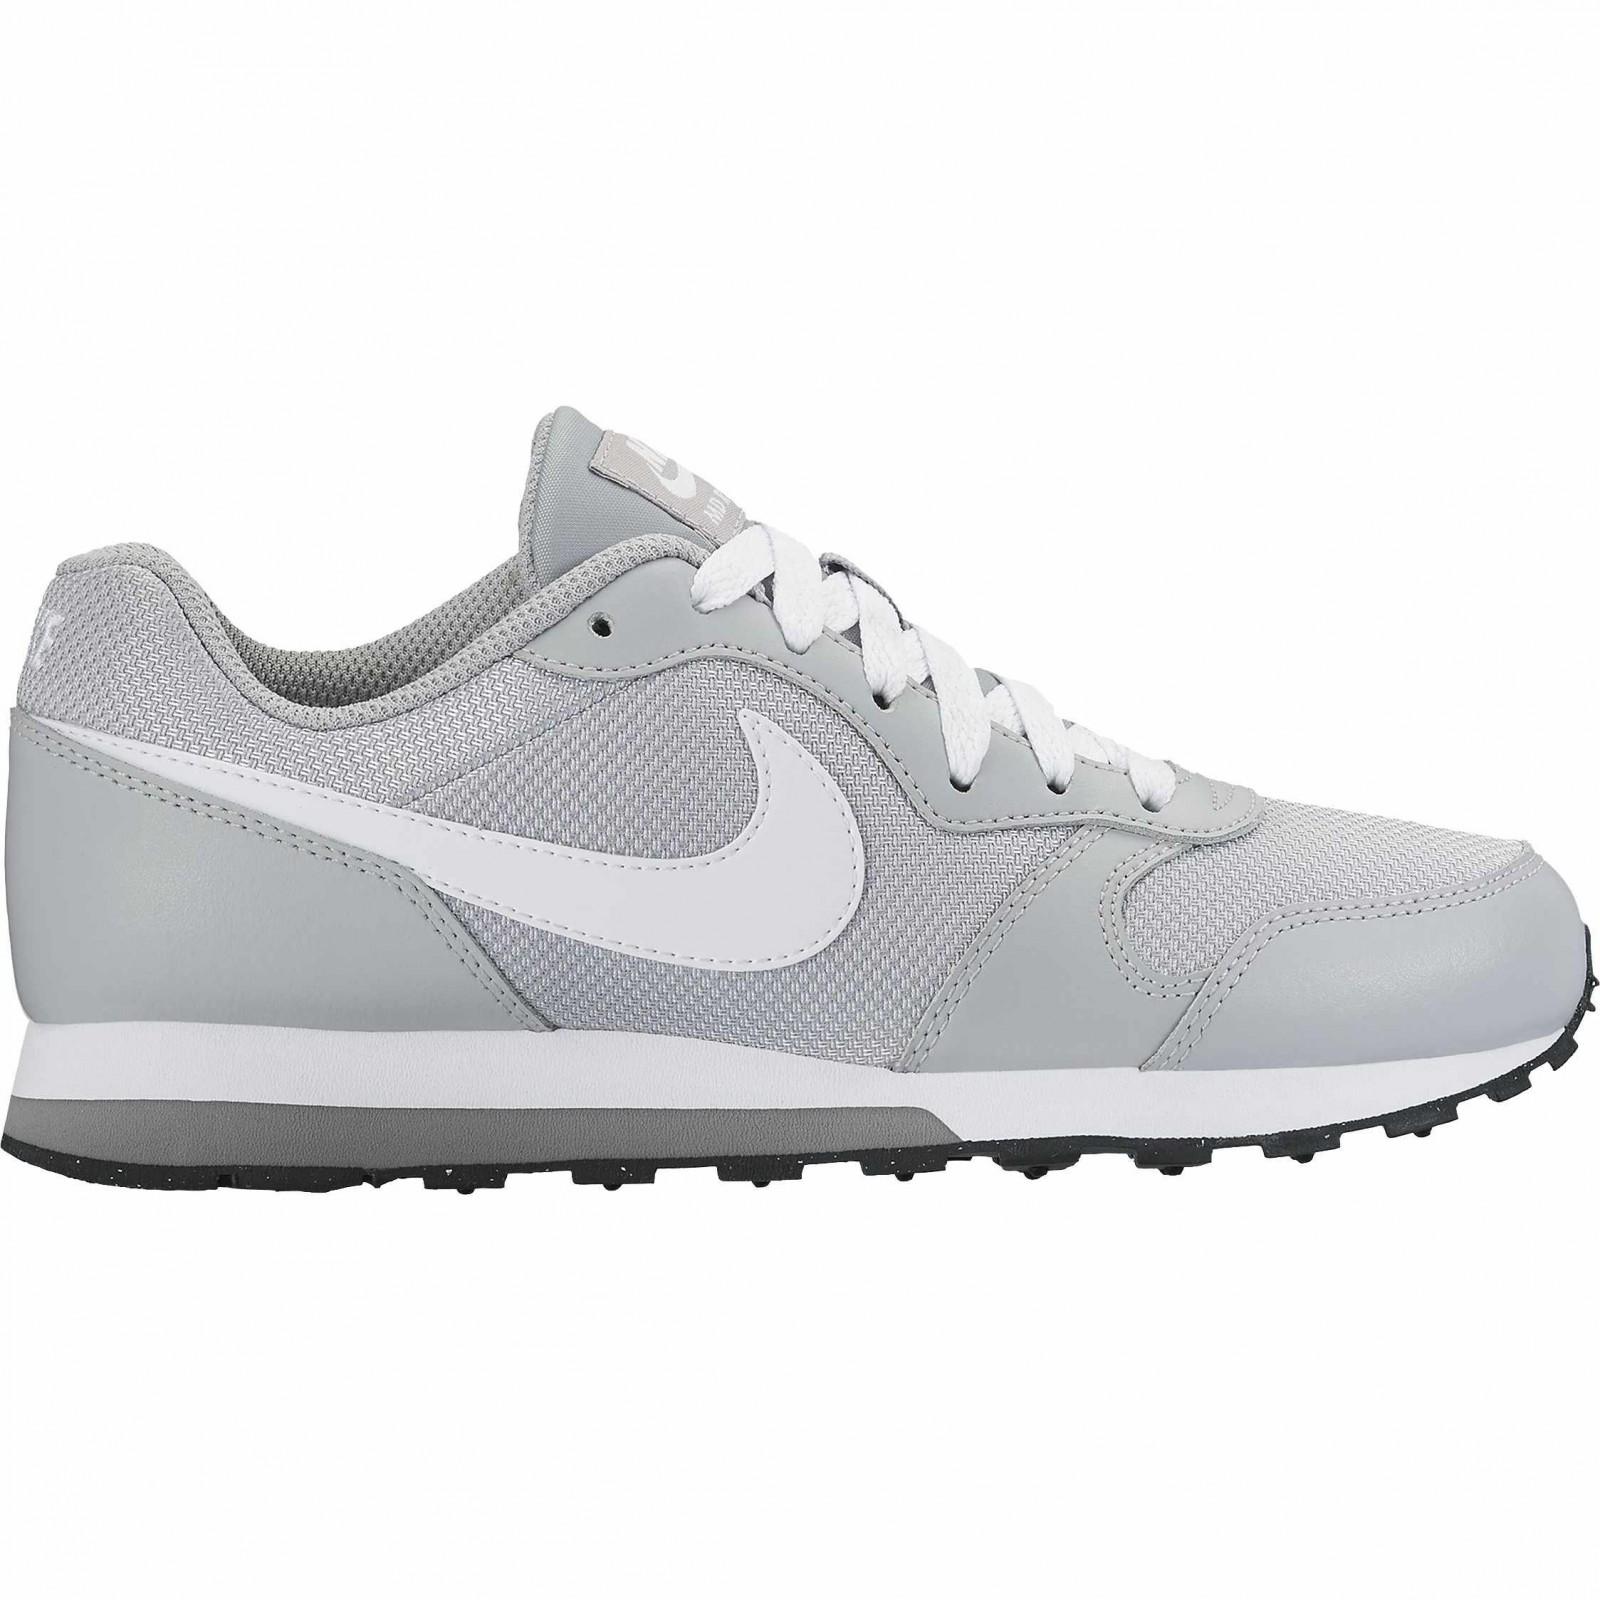 8169eec9780 Dětské tenisky Nike MD RUNNER 2 (GS)